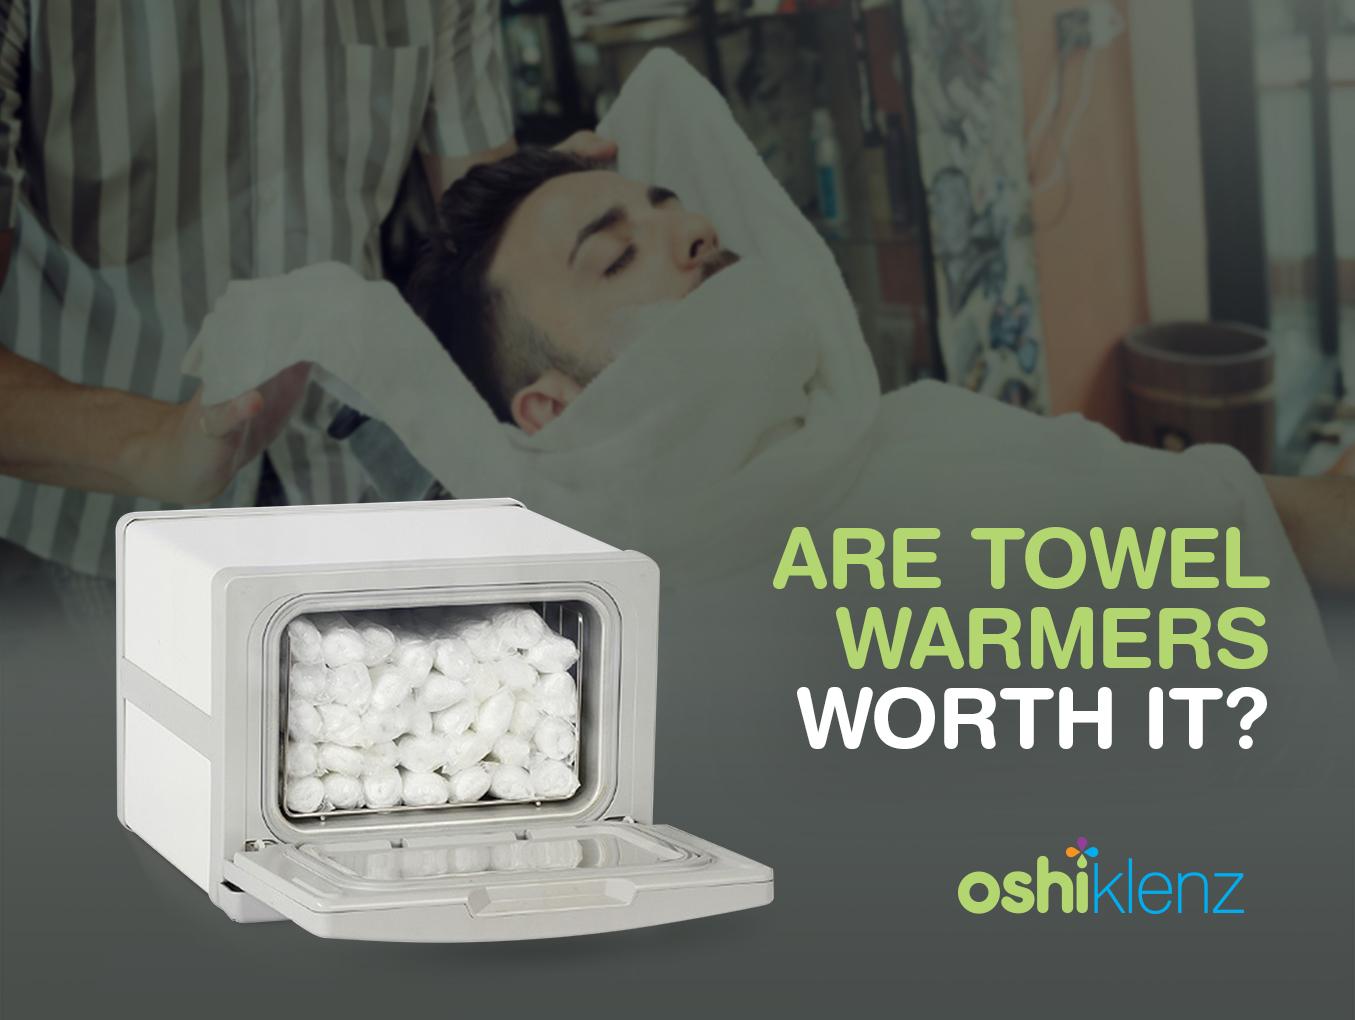 are-hot-towel-warmers-worth-it--oshiklenz-australia